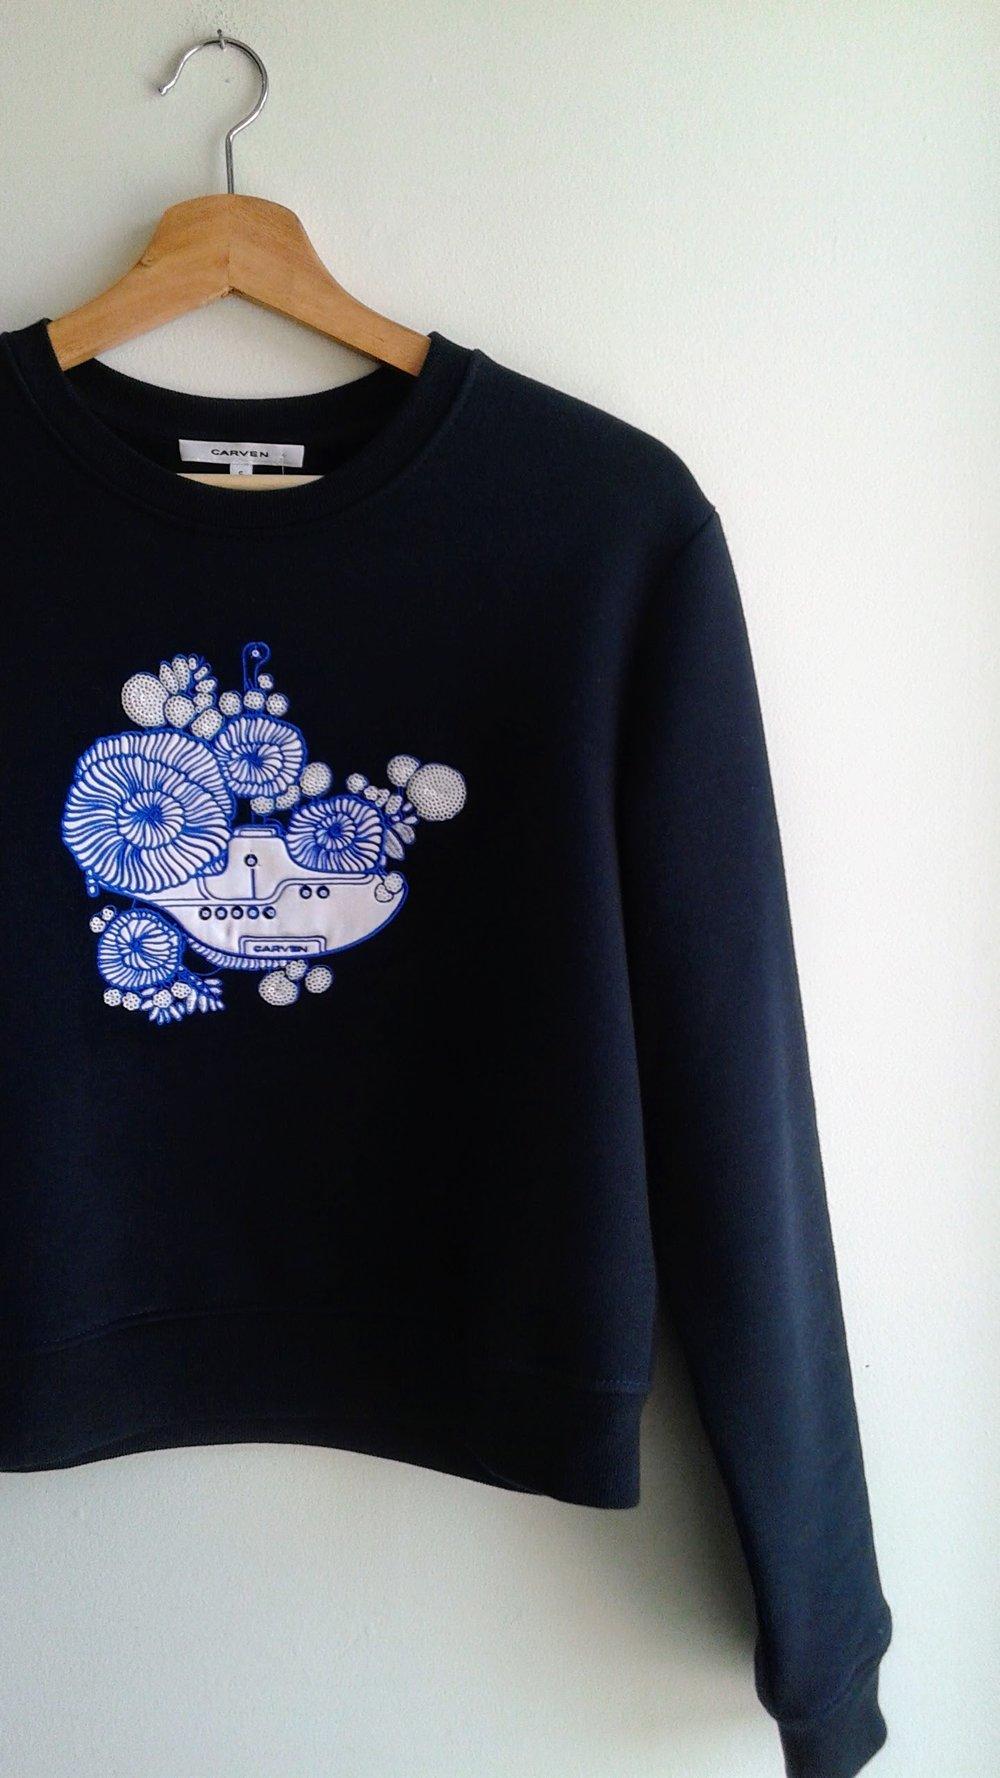 Carven sweatshirt; Size S, $95